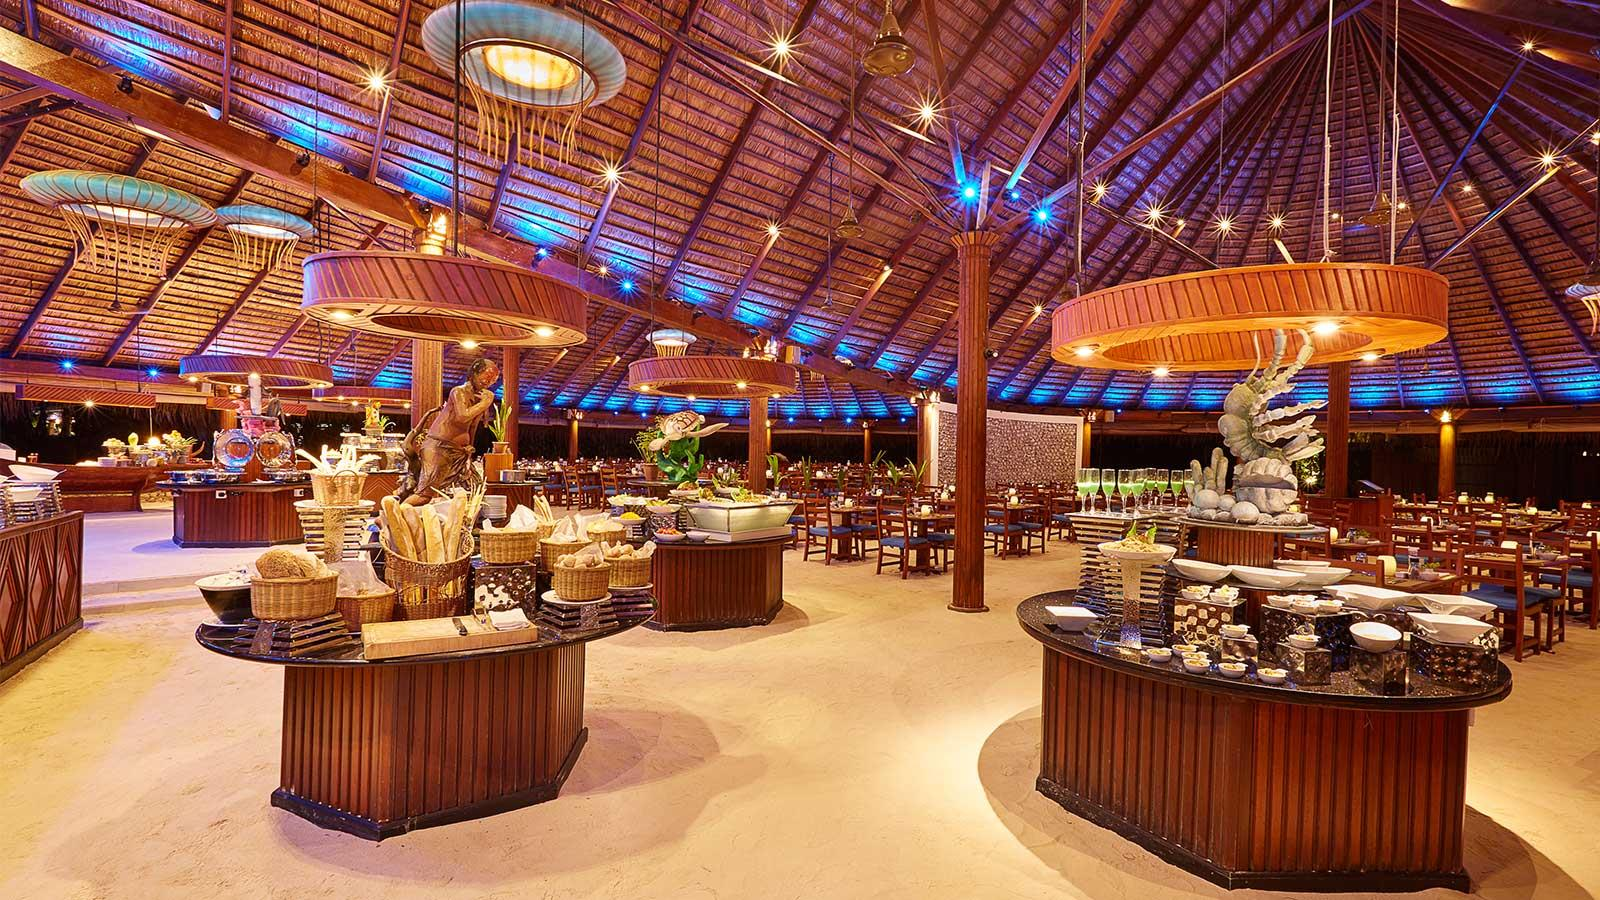 kuredu-island-resort-spa-genel-0017